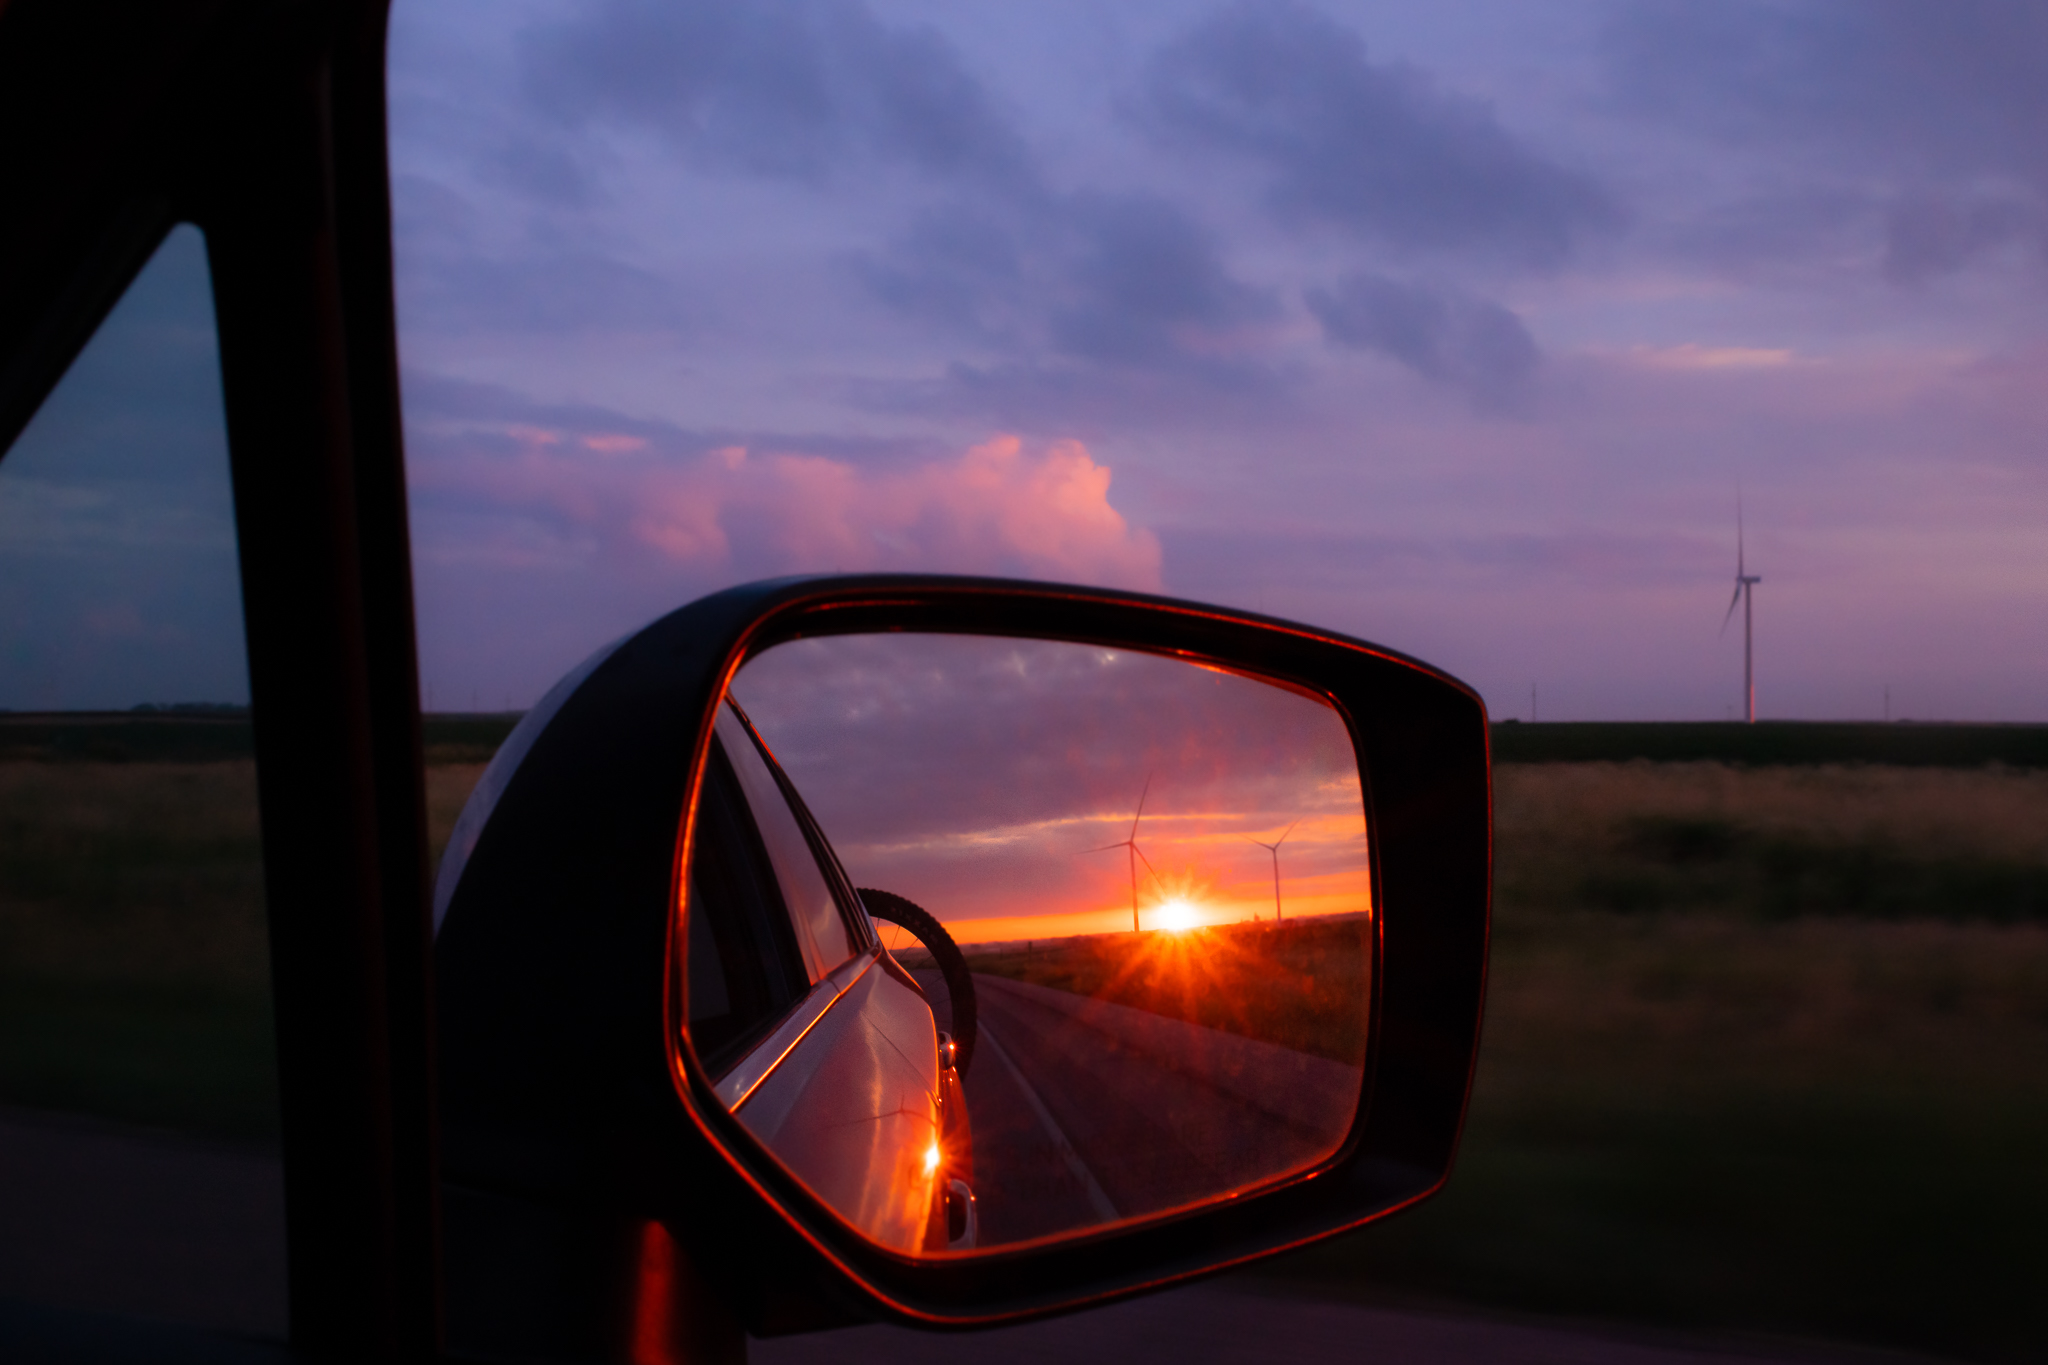 Somewhere in South Dakota heading back home.